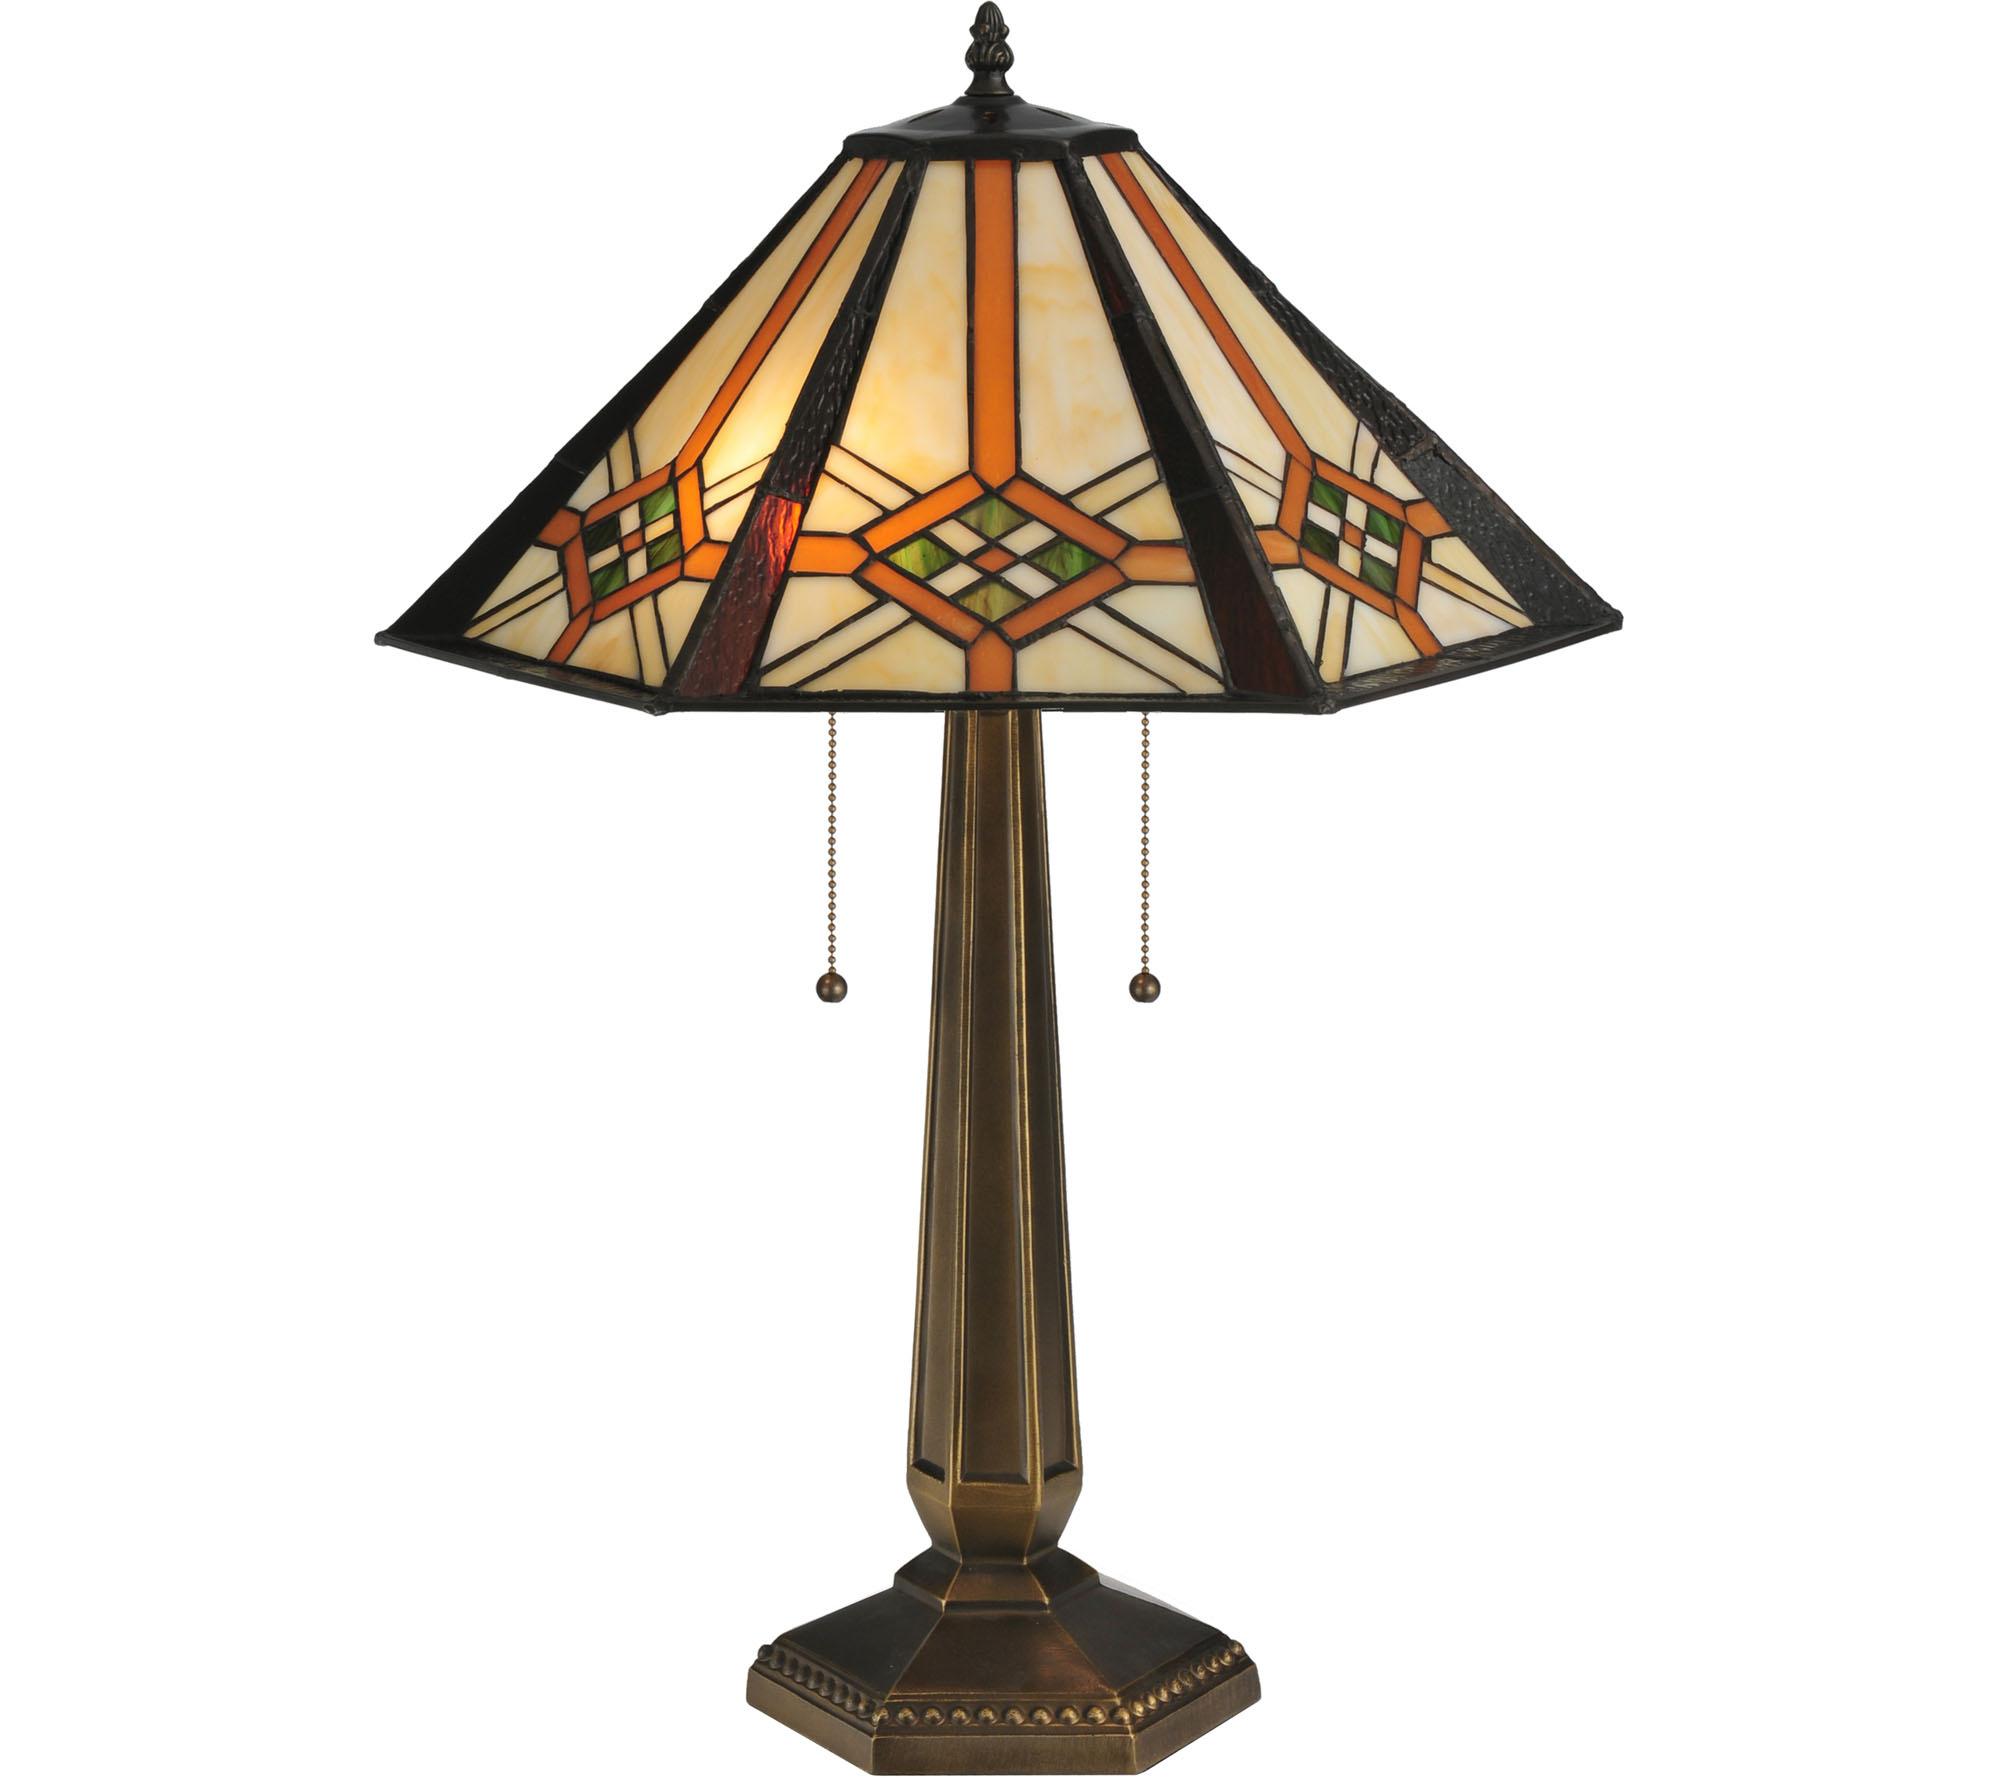 Meyda tiffany style 26 crosshairs mission table lamp qvc com